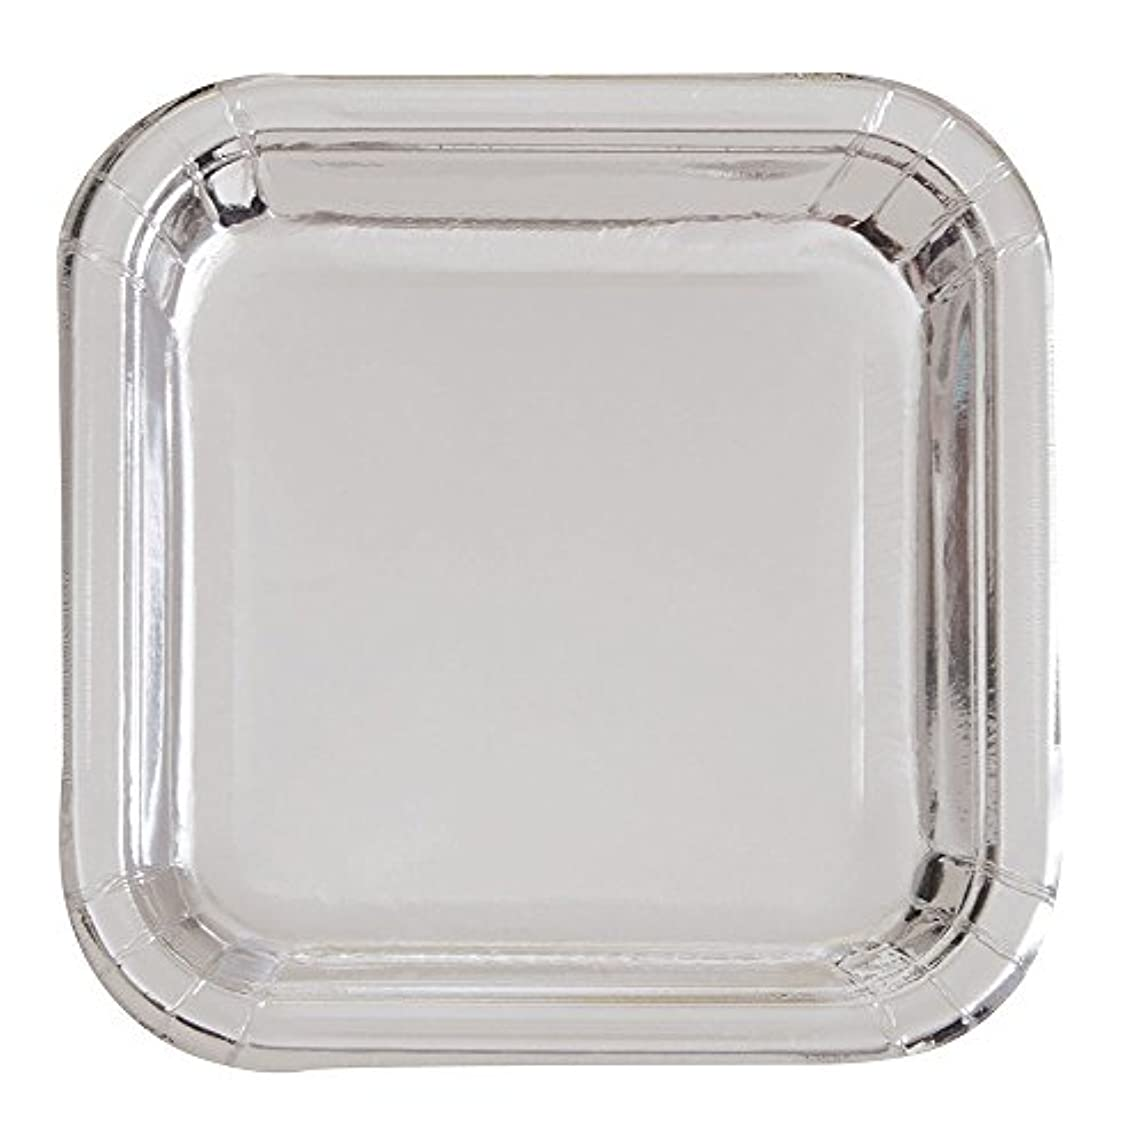 Square Foil Silver Paper Cake Plates, 8ct